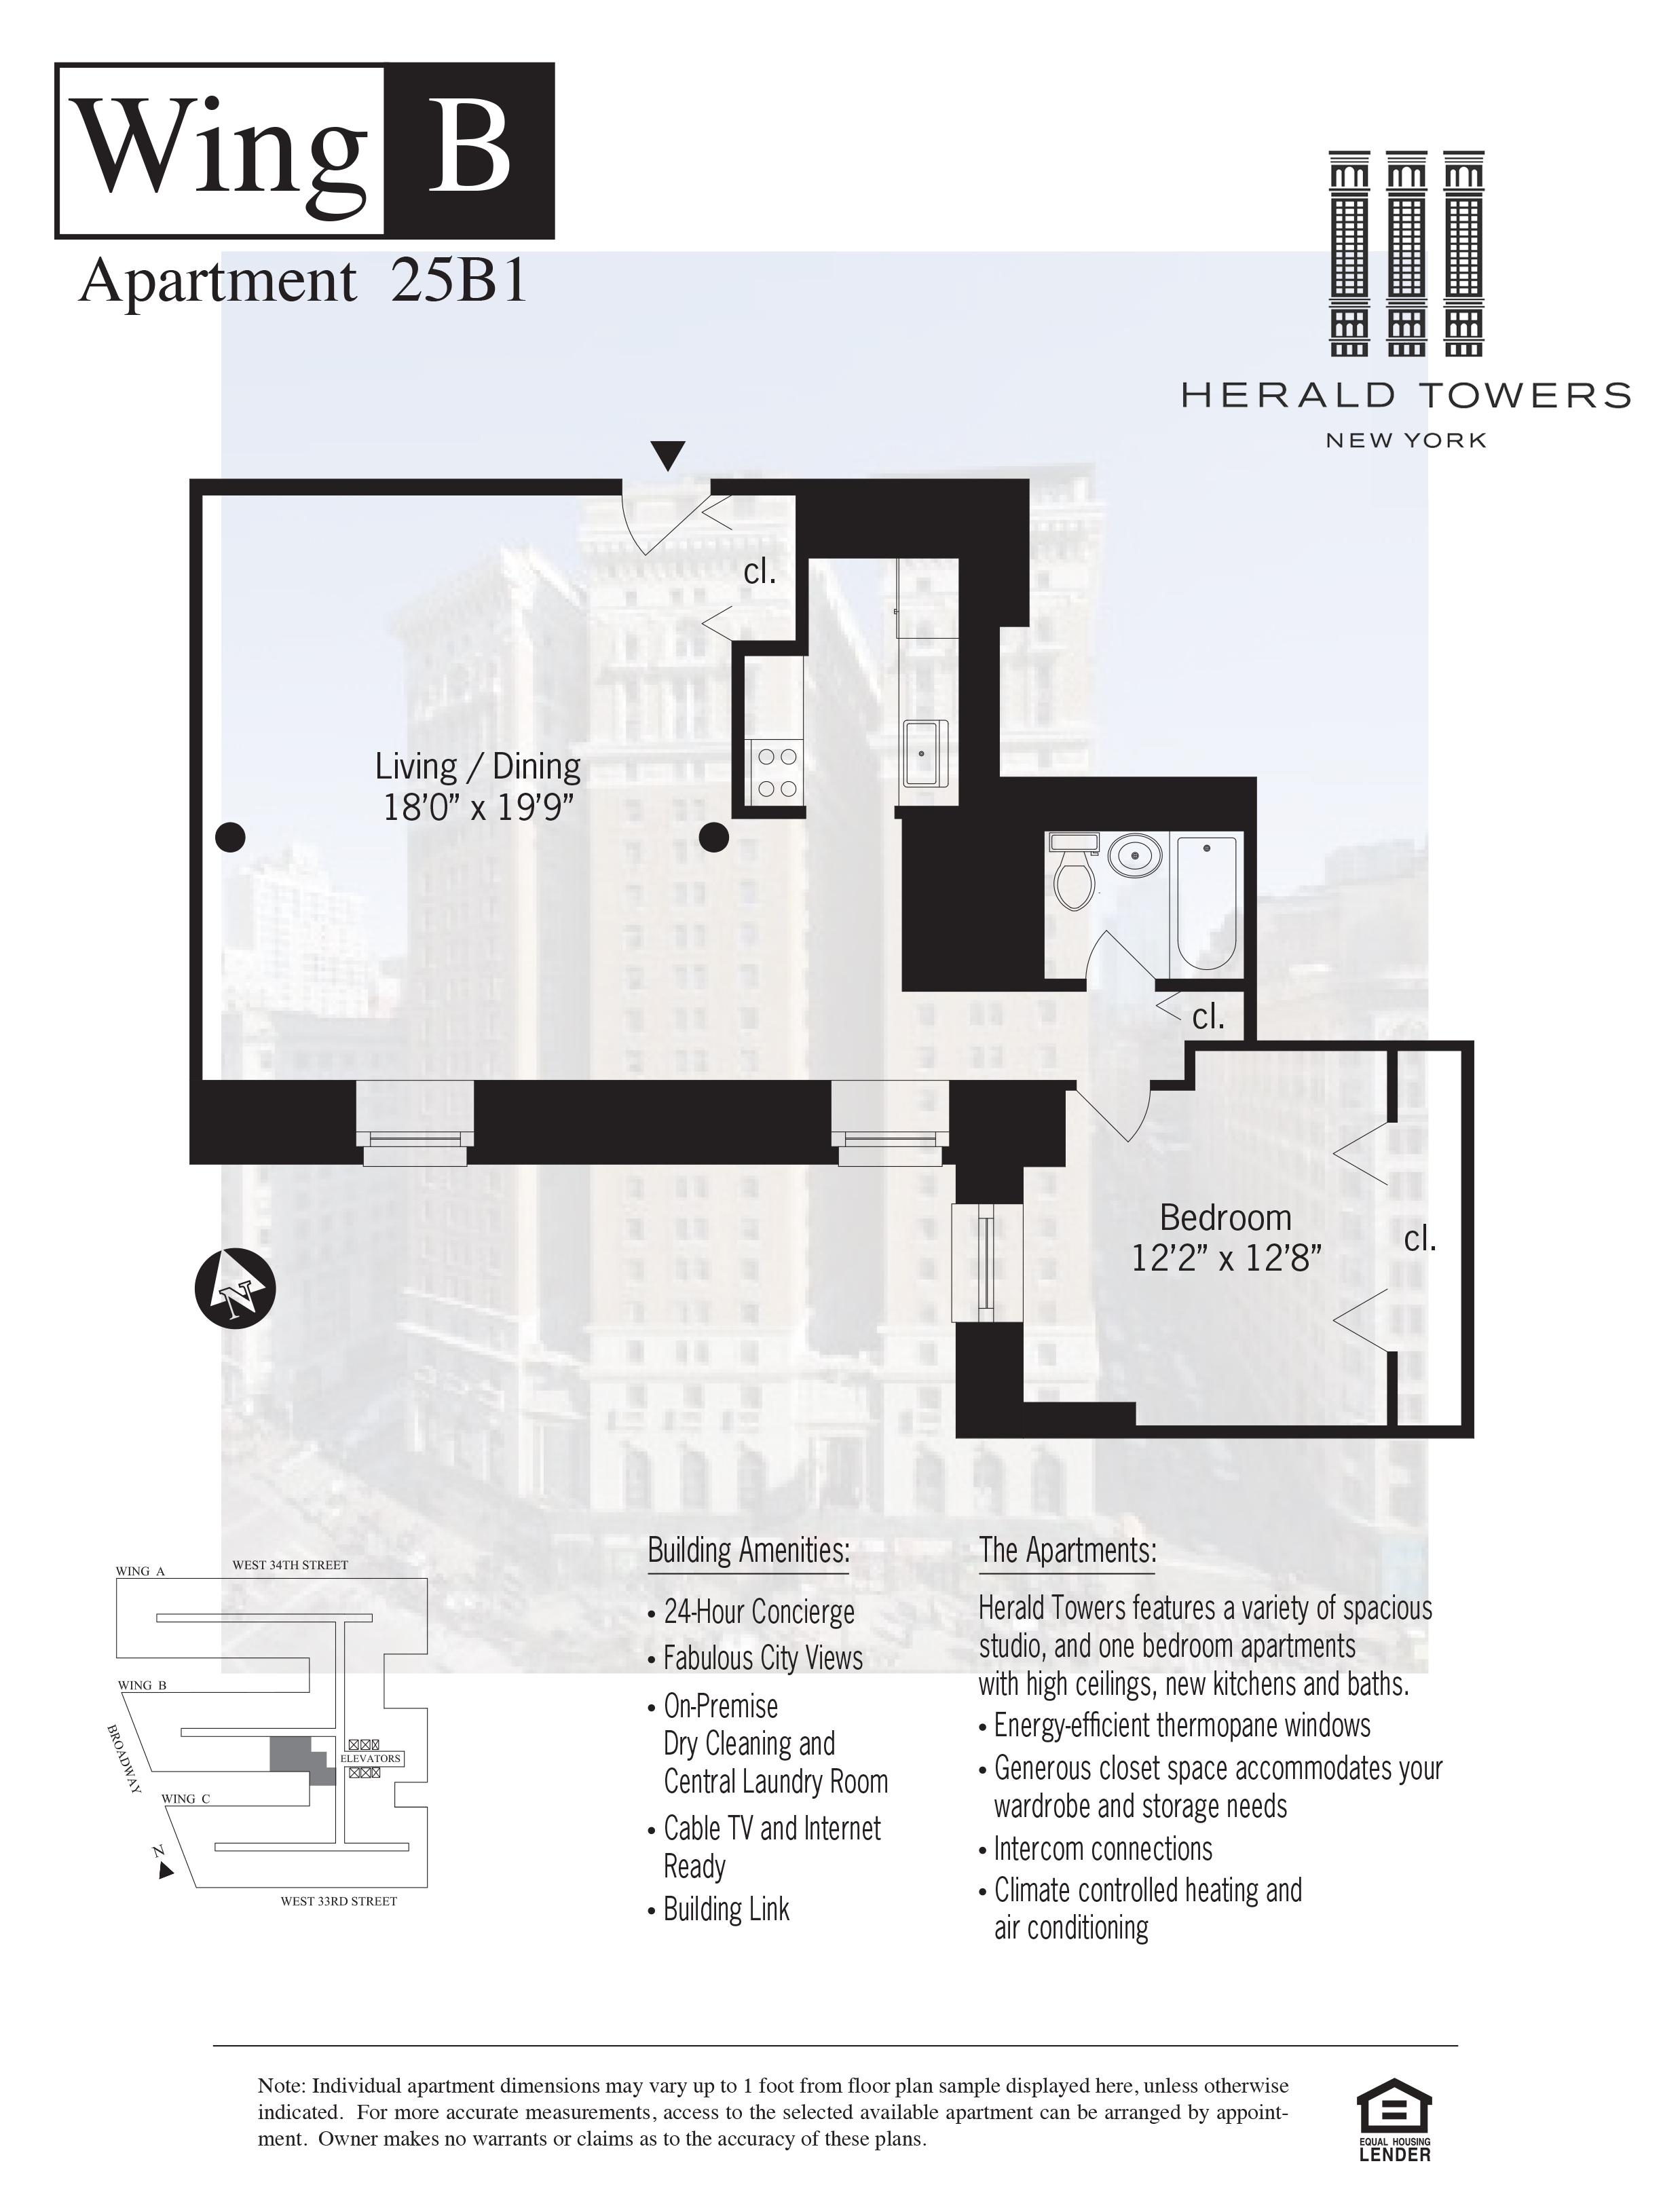 Floor plan for 25B01